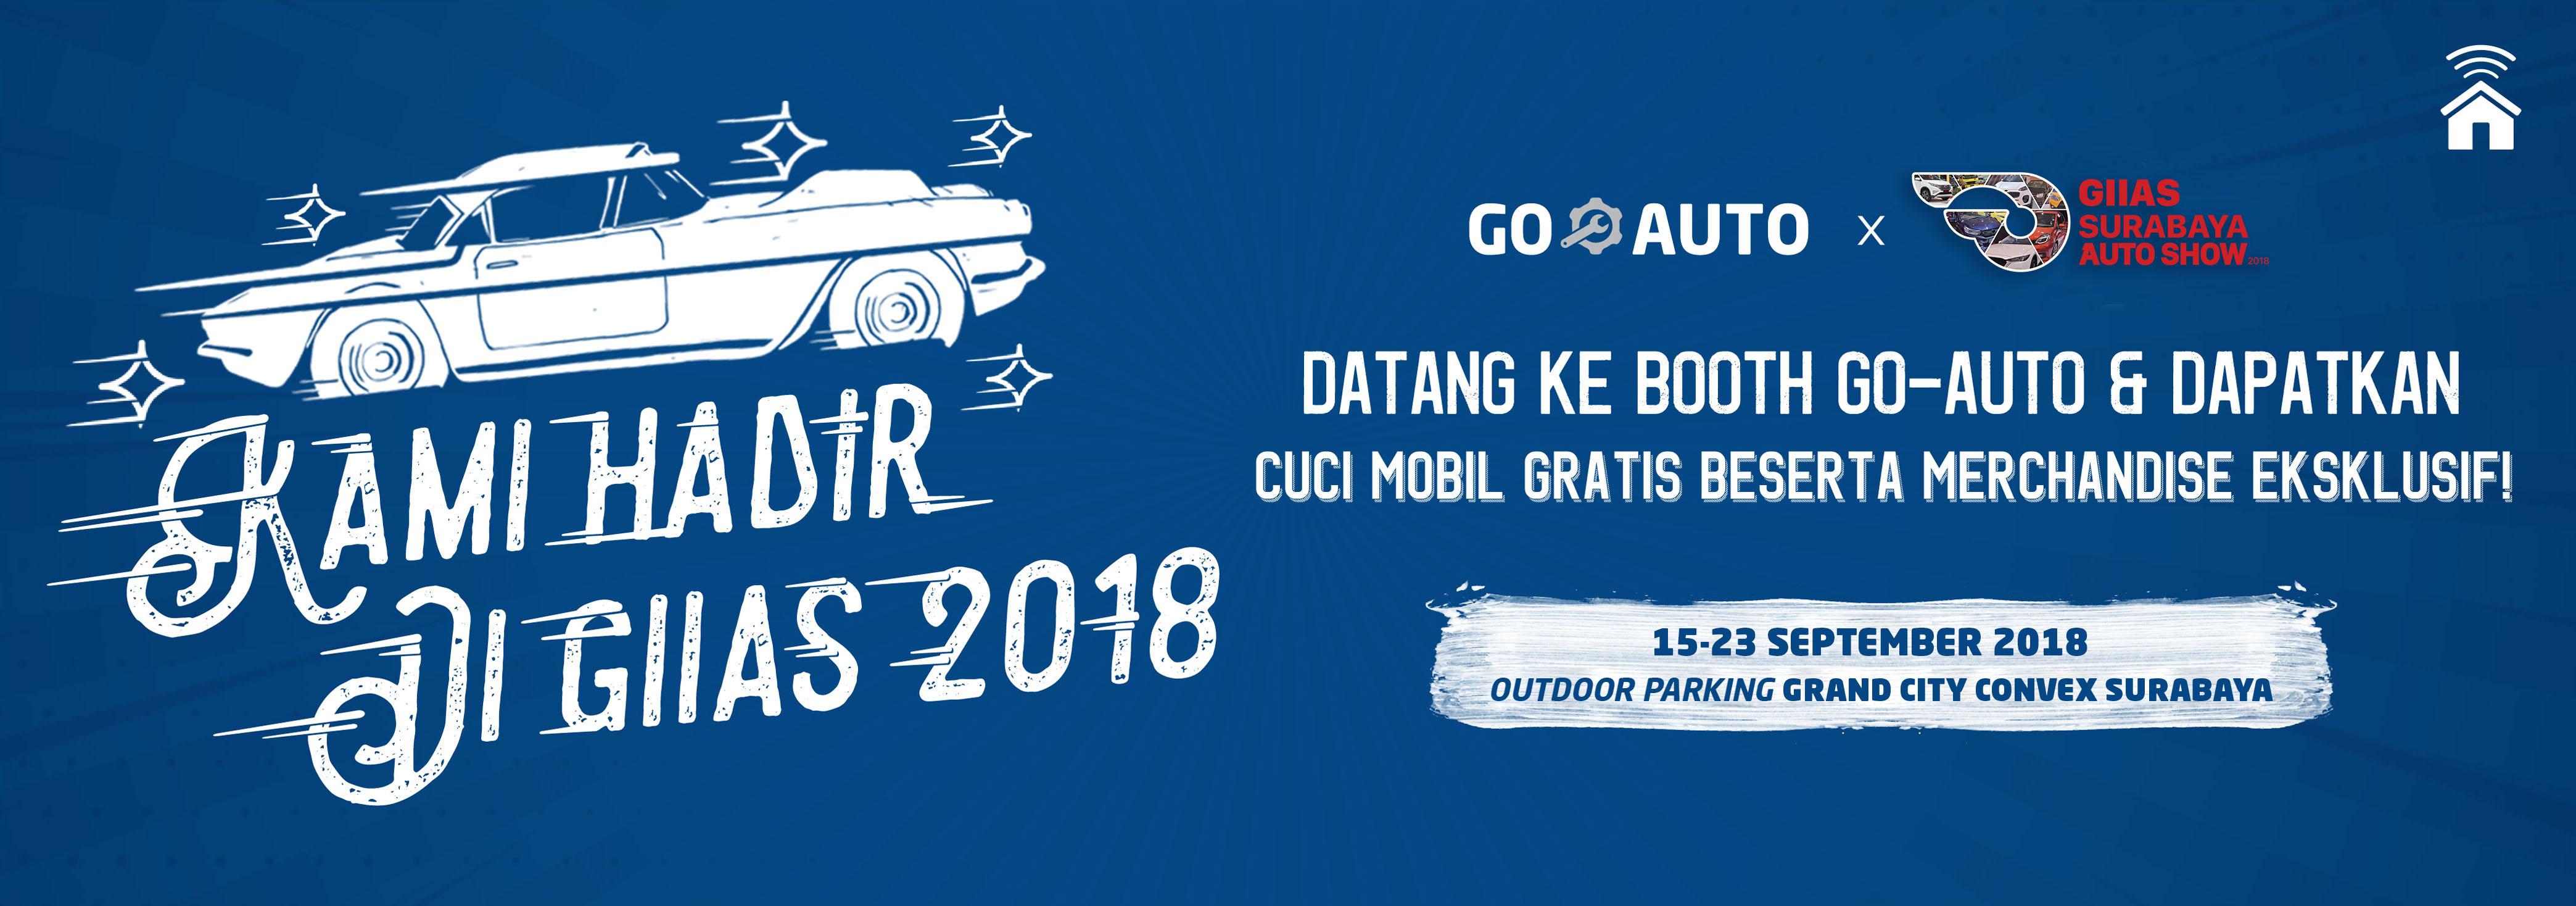 GO-AUTO Hadir di GIIAS Surabaya! Ada Merchandise Keren & Cuci Mobil GRATIS!